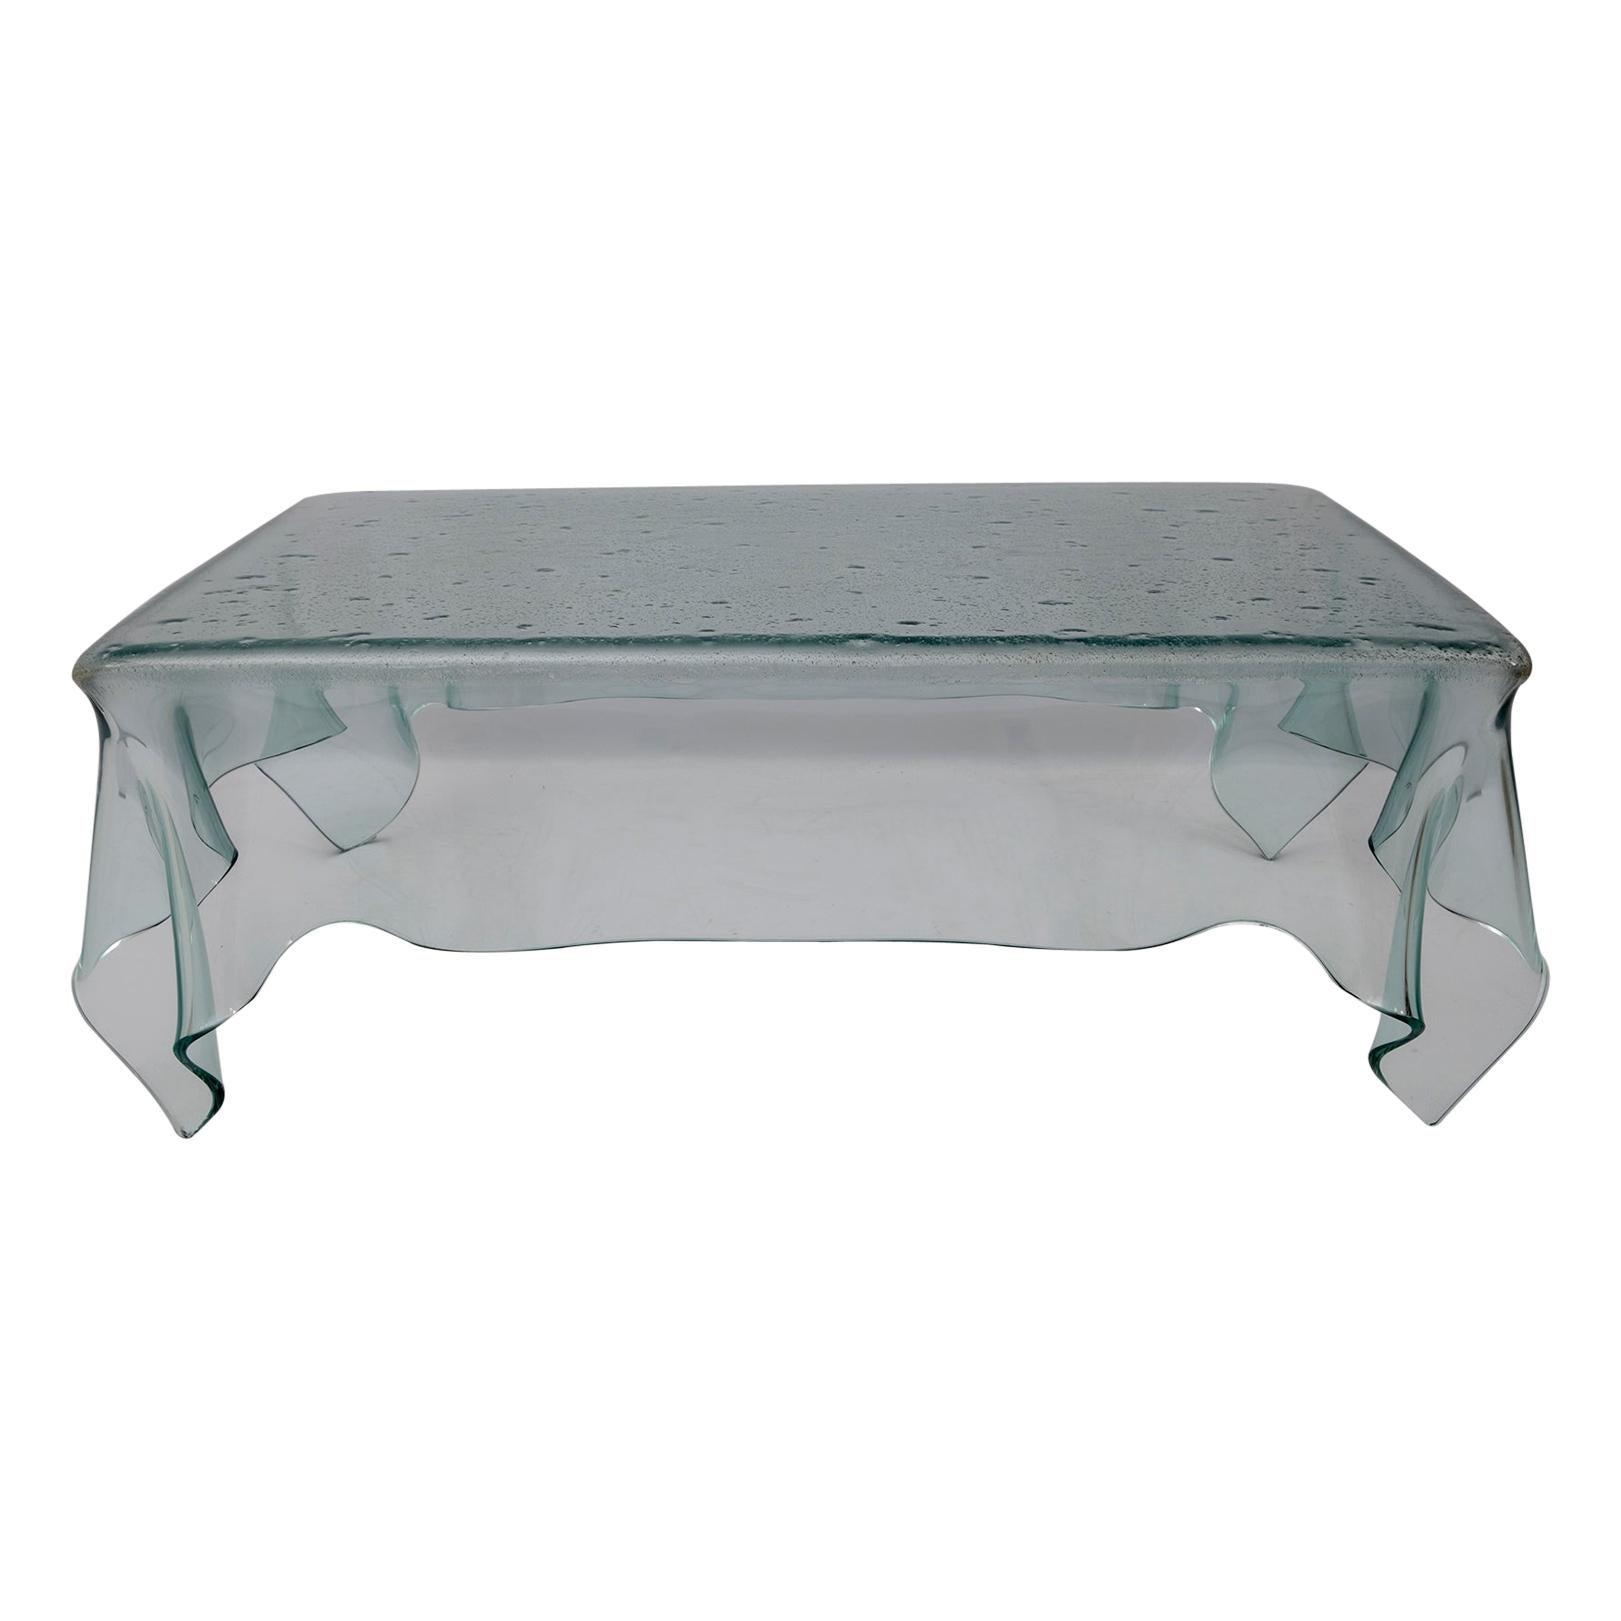 Postmodern Italian Handkerchief Crystal Coffee Table, 1980s